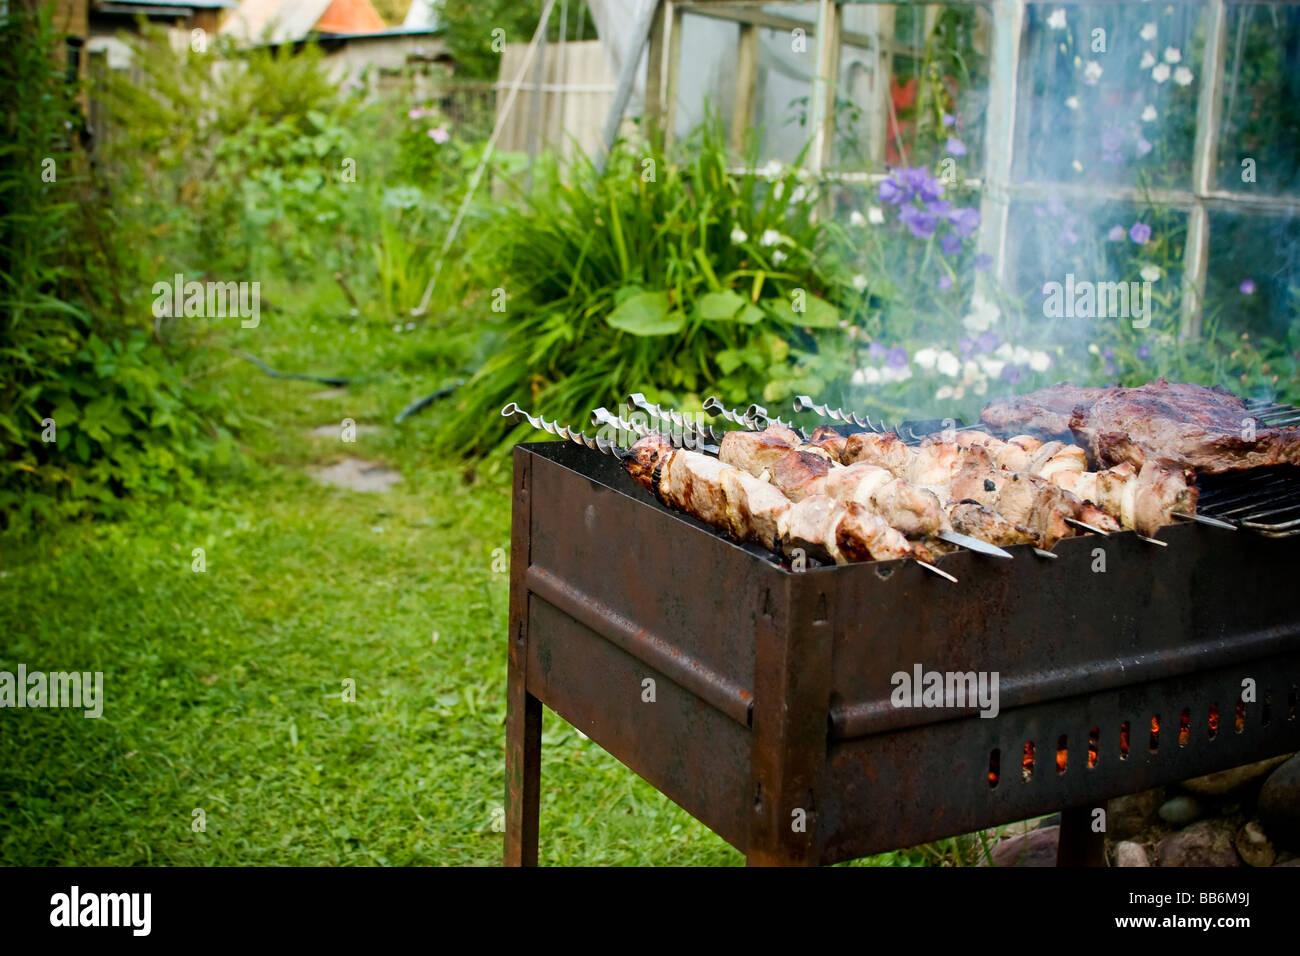 cooking pork sticks